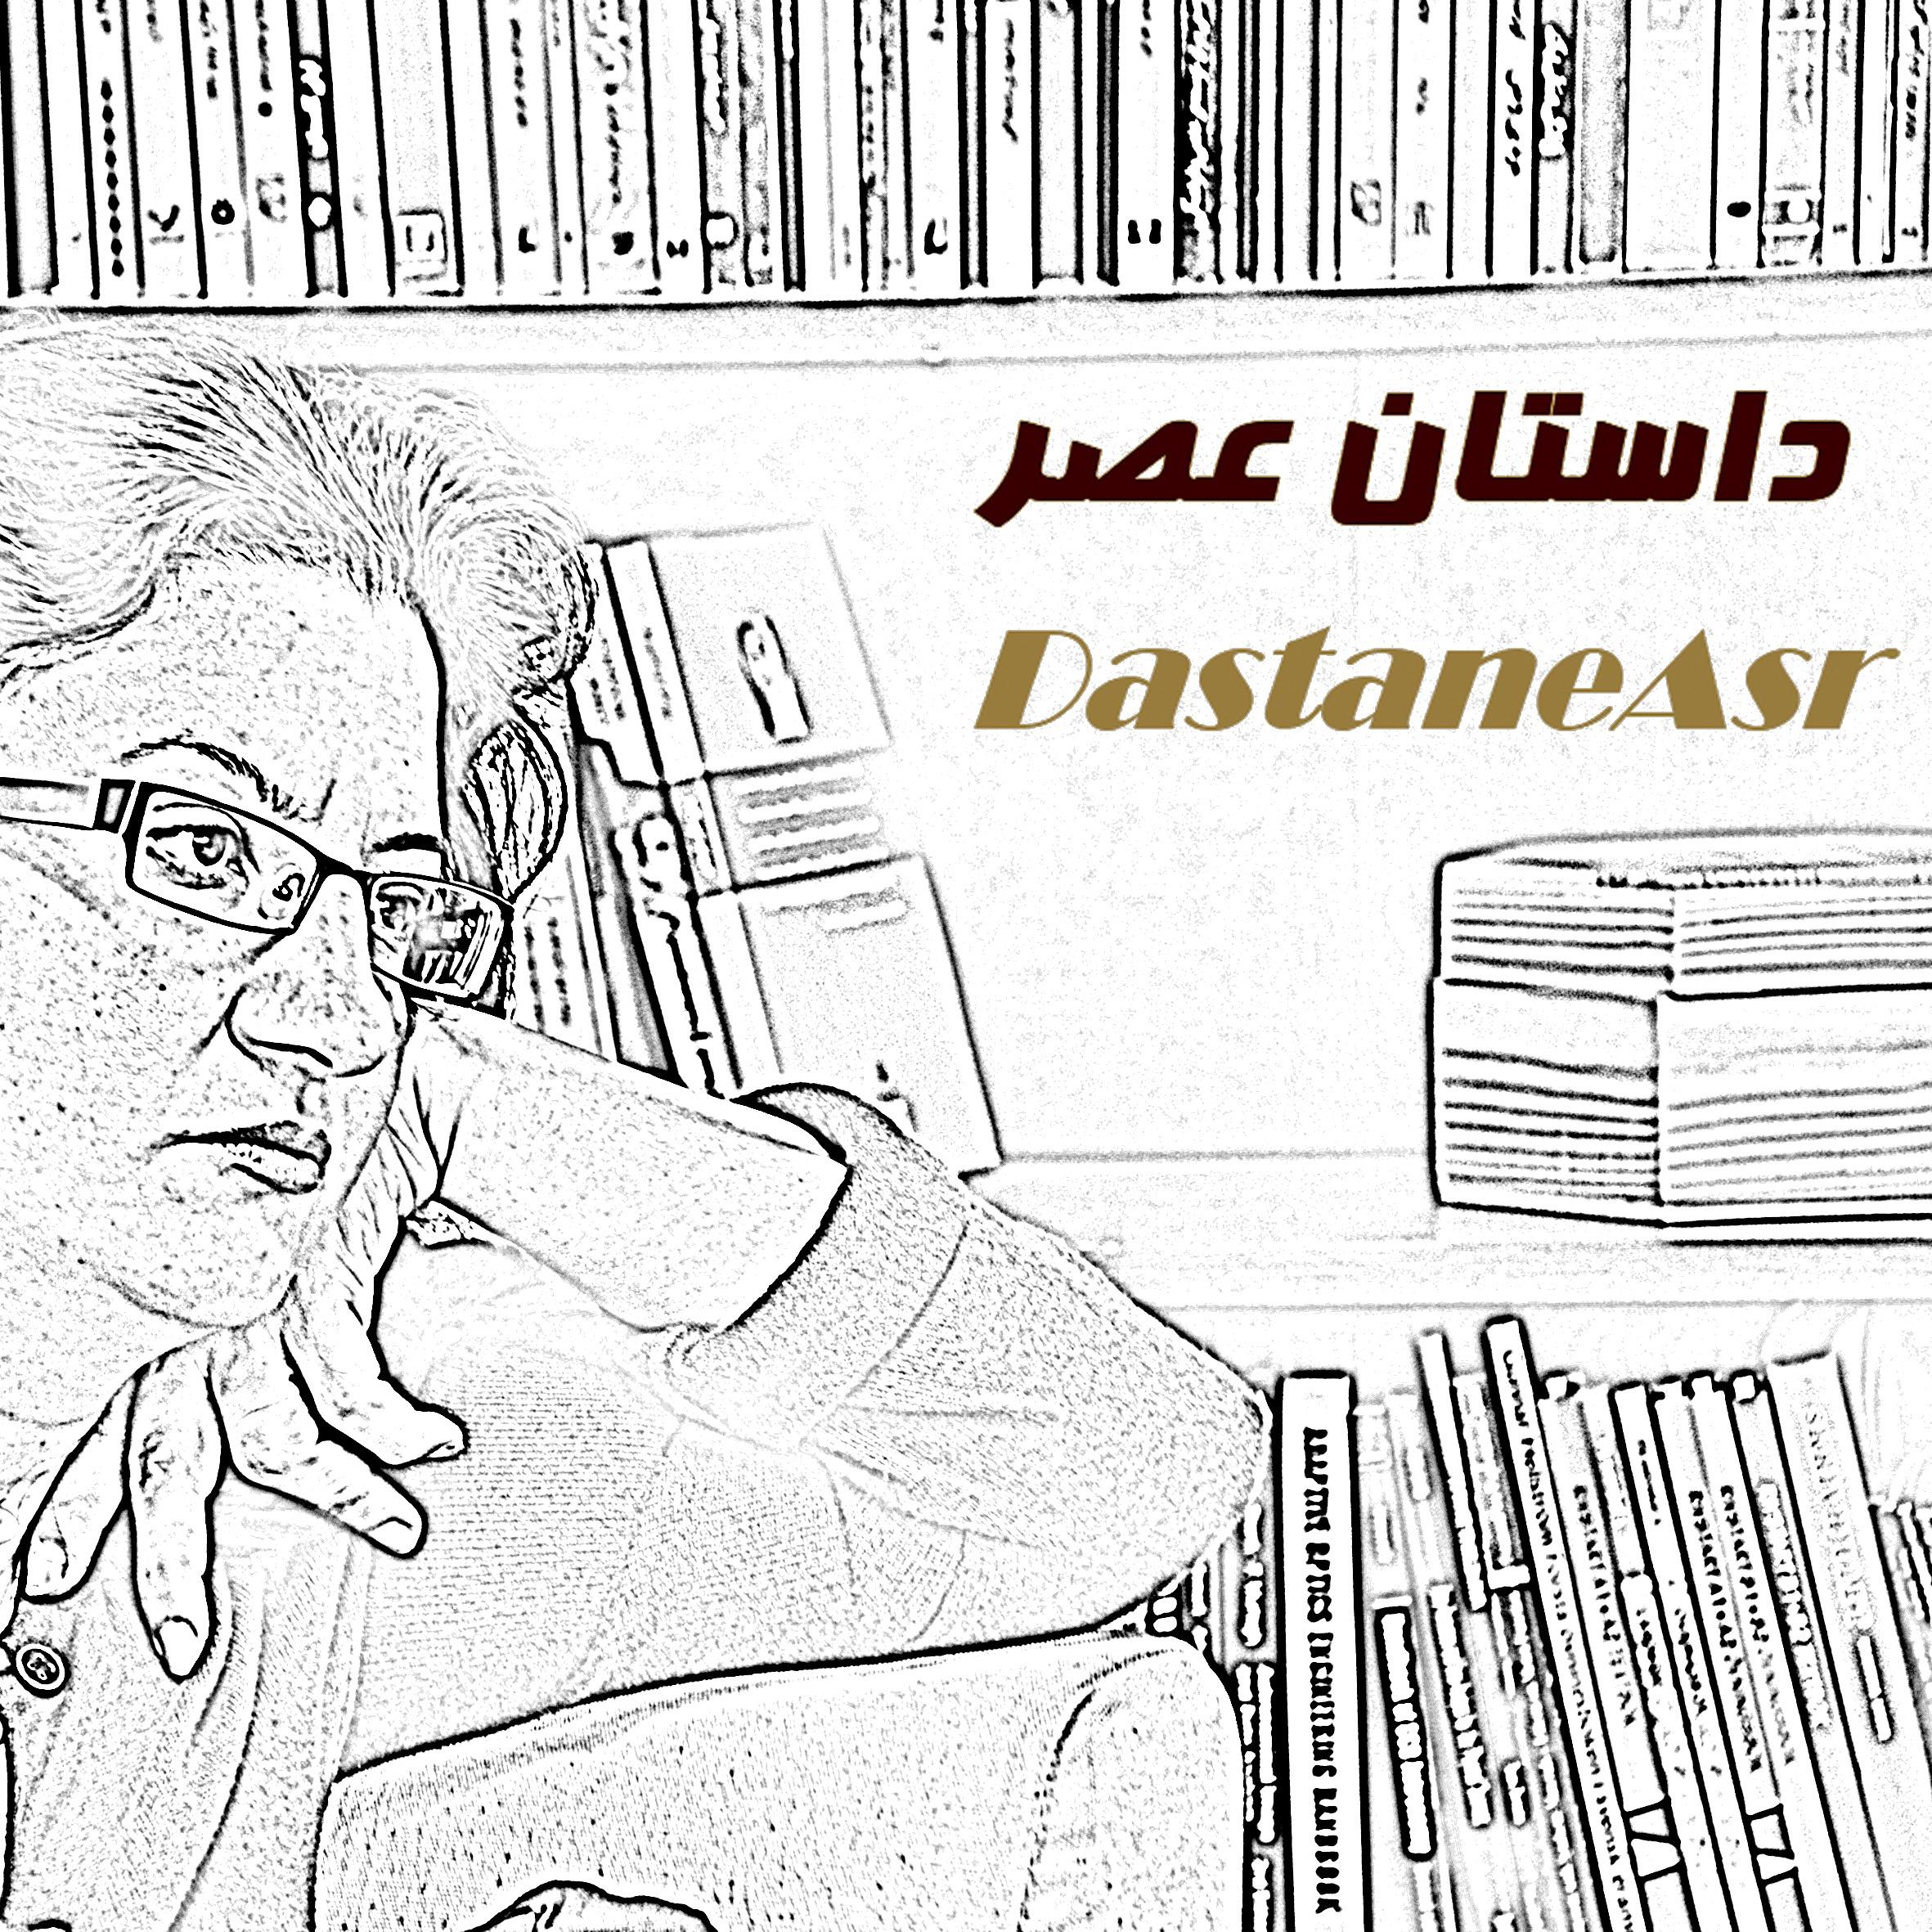 DastaneAsr